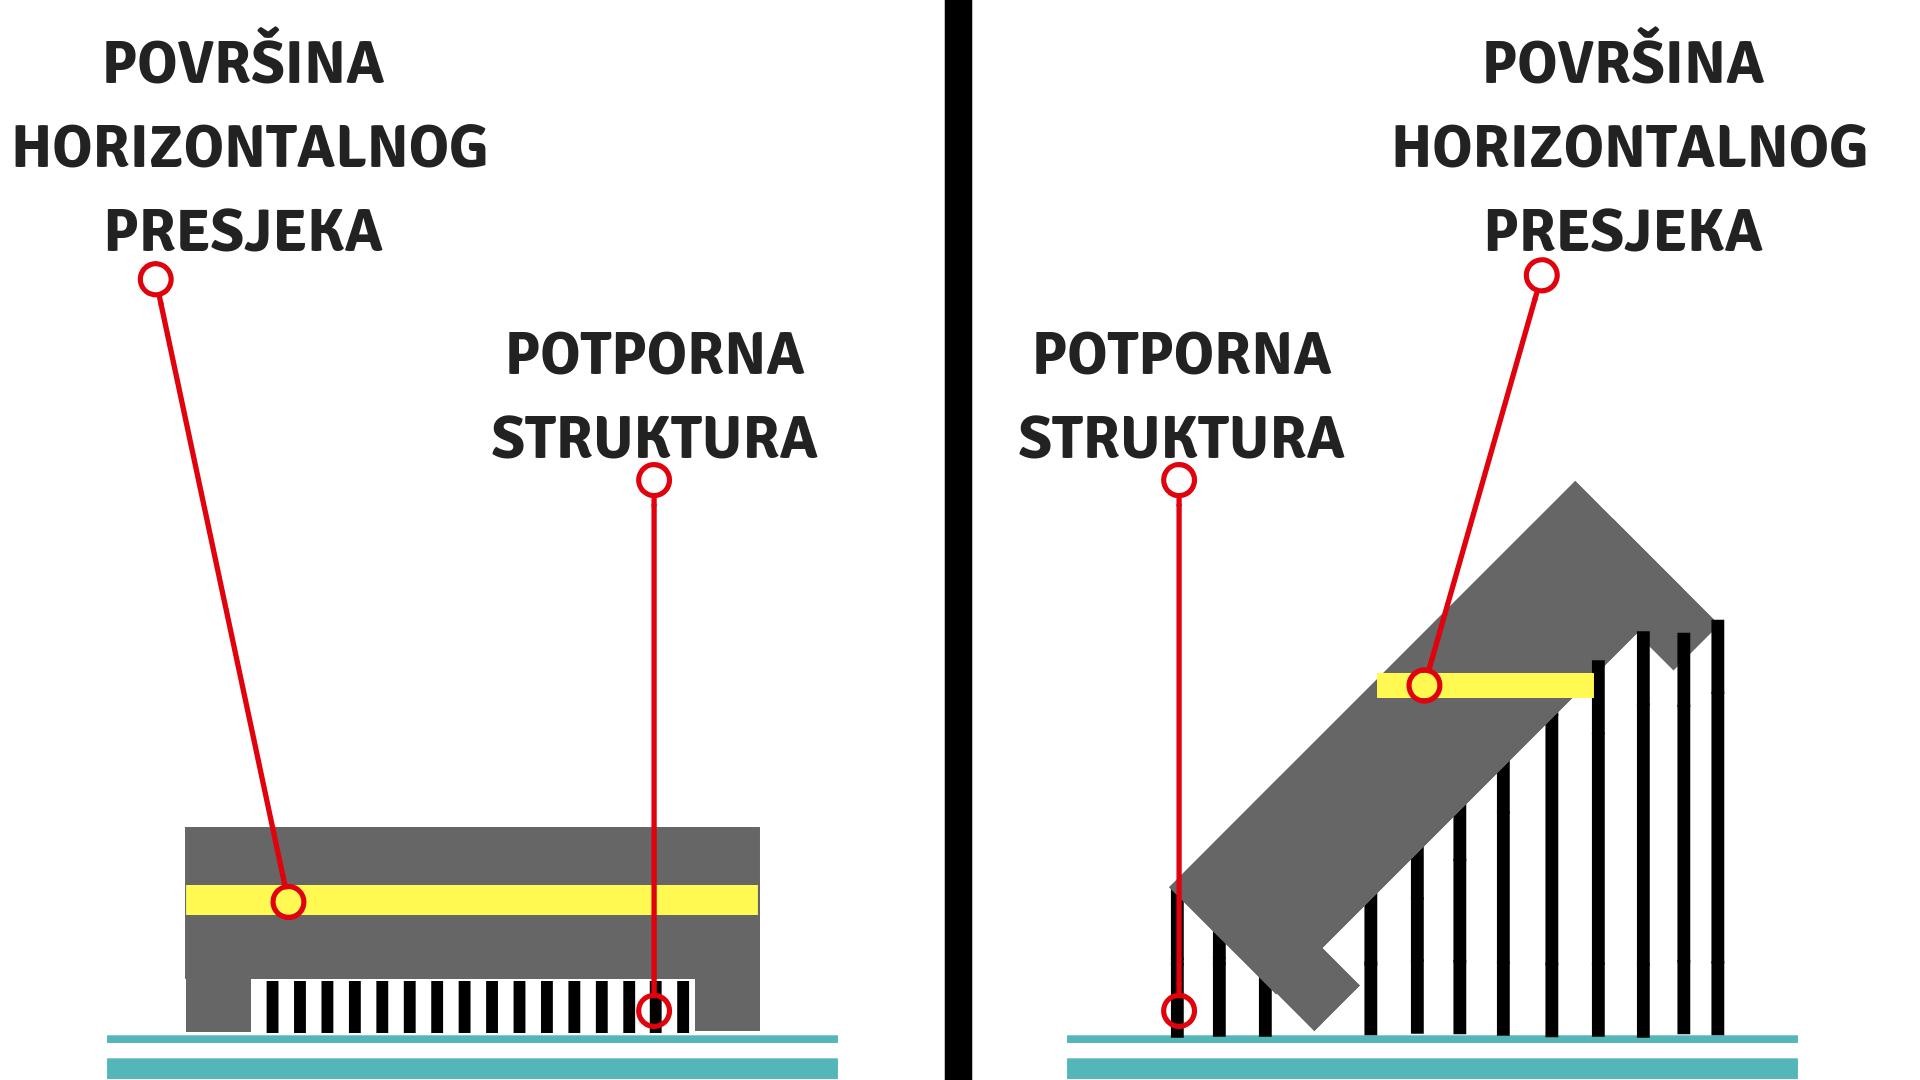 prikaz nepravilne i pravilne orijentacije objekta - nepravilo - lijevo, pravilno - desno